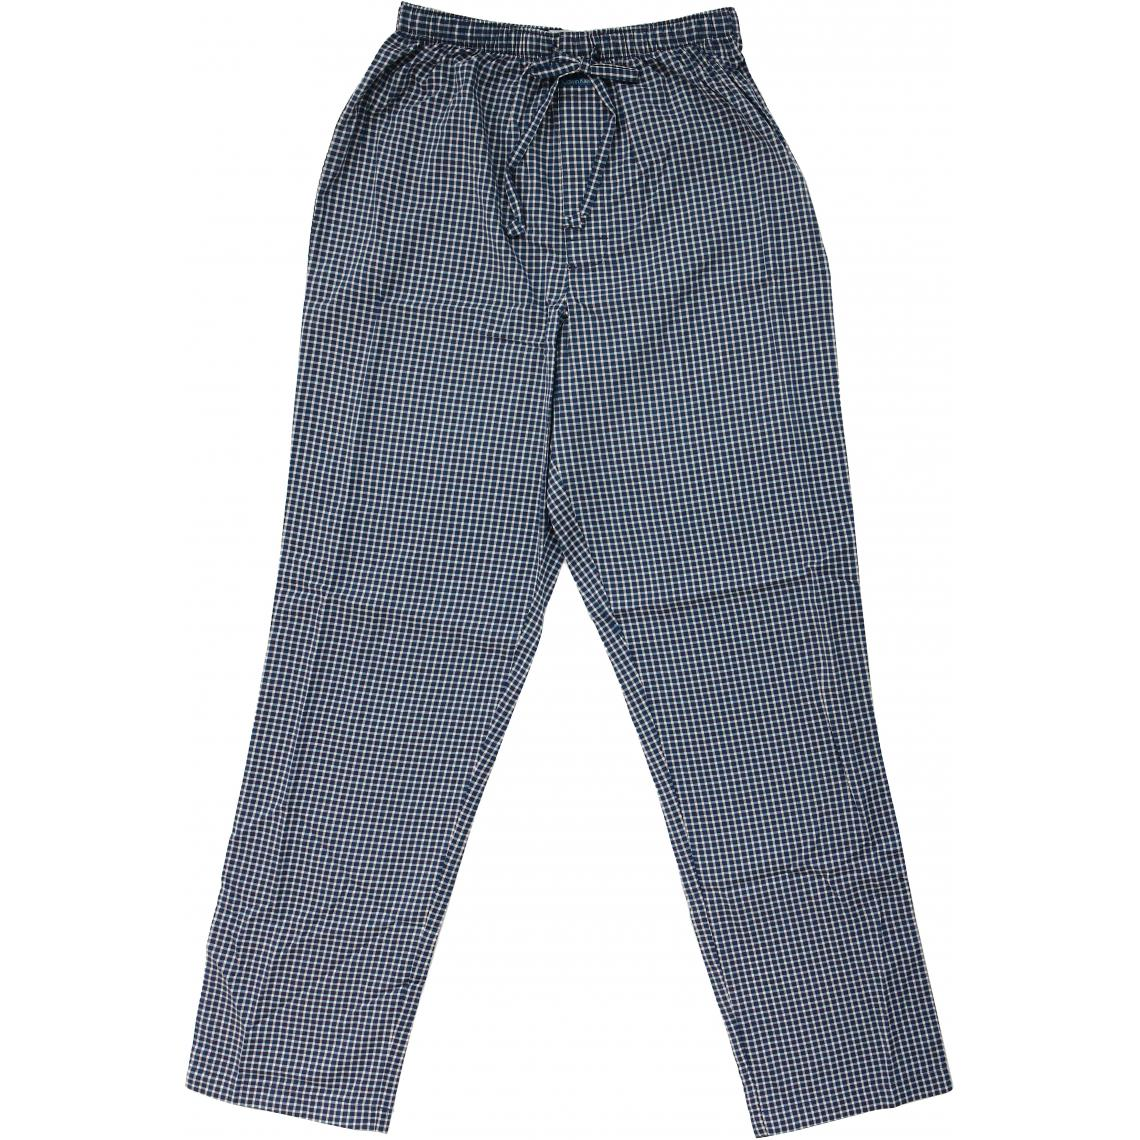 PANTALON PYJAMA - Classique-Calvin Klein Underwear - 3Suisses